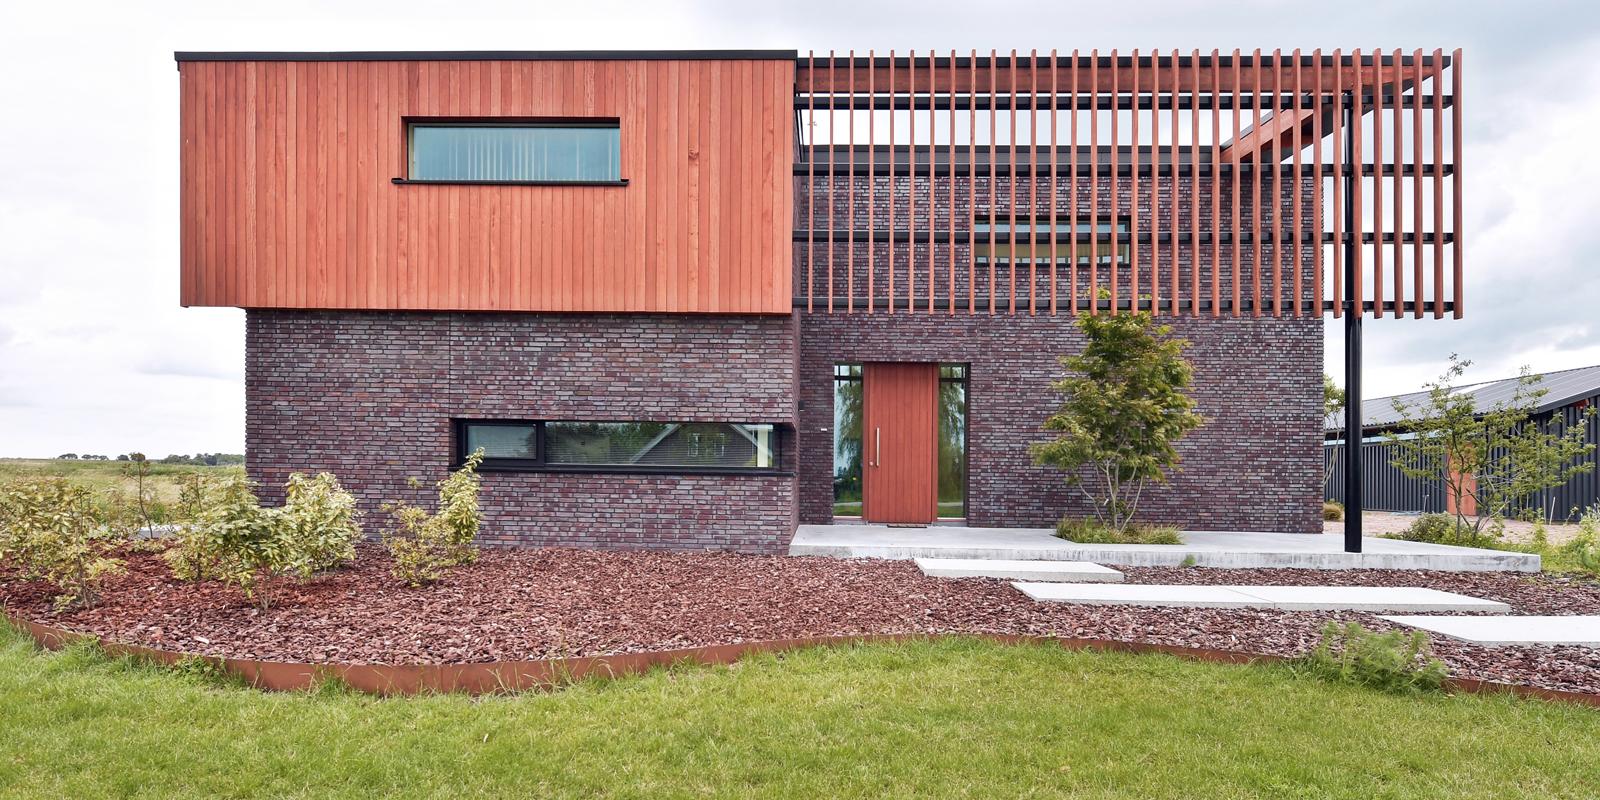 Natuurlijke omgeving, 123DV Architecten, Exterieur, Gevelbekleding, Houten gevel, Tuindesign, Architectuur